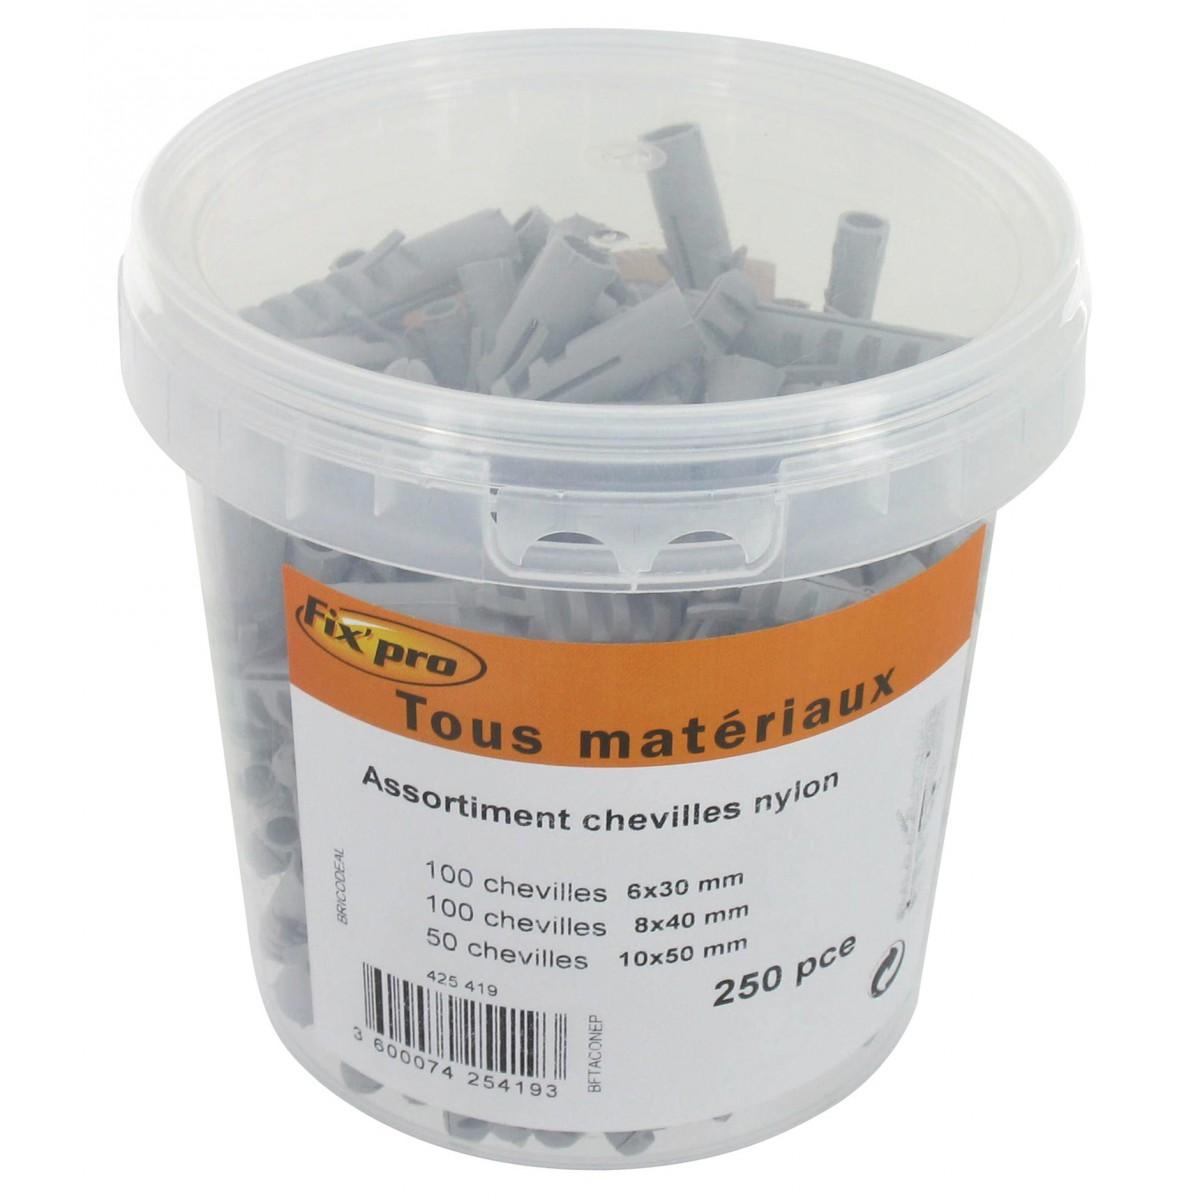 Assortiment de chevilles nylon Fix'Pro - 30 x 6 mm (x 100), 40 x 8 mm (x 100), 50 x 10 mm (x 50) - Vendu par 250